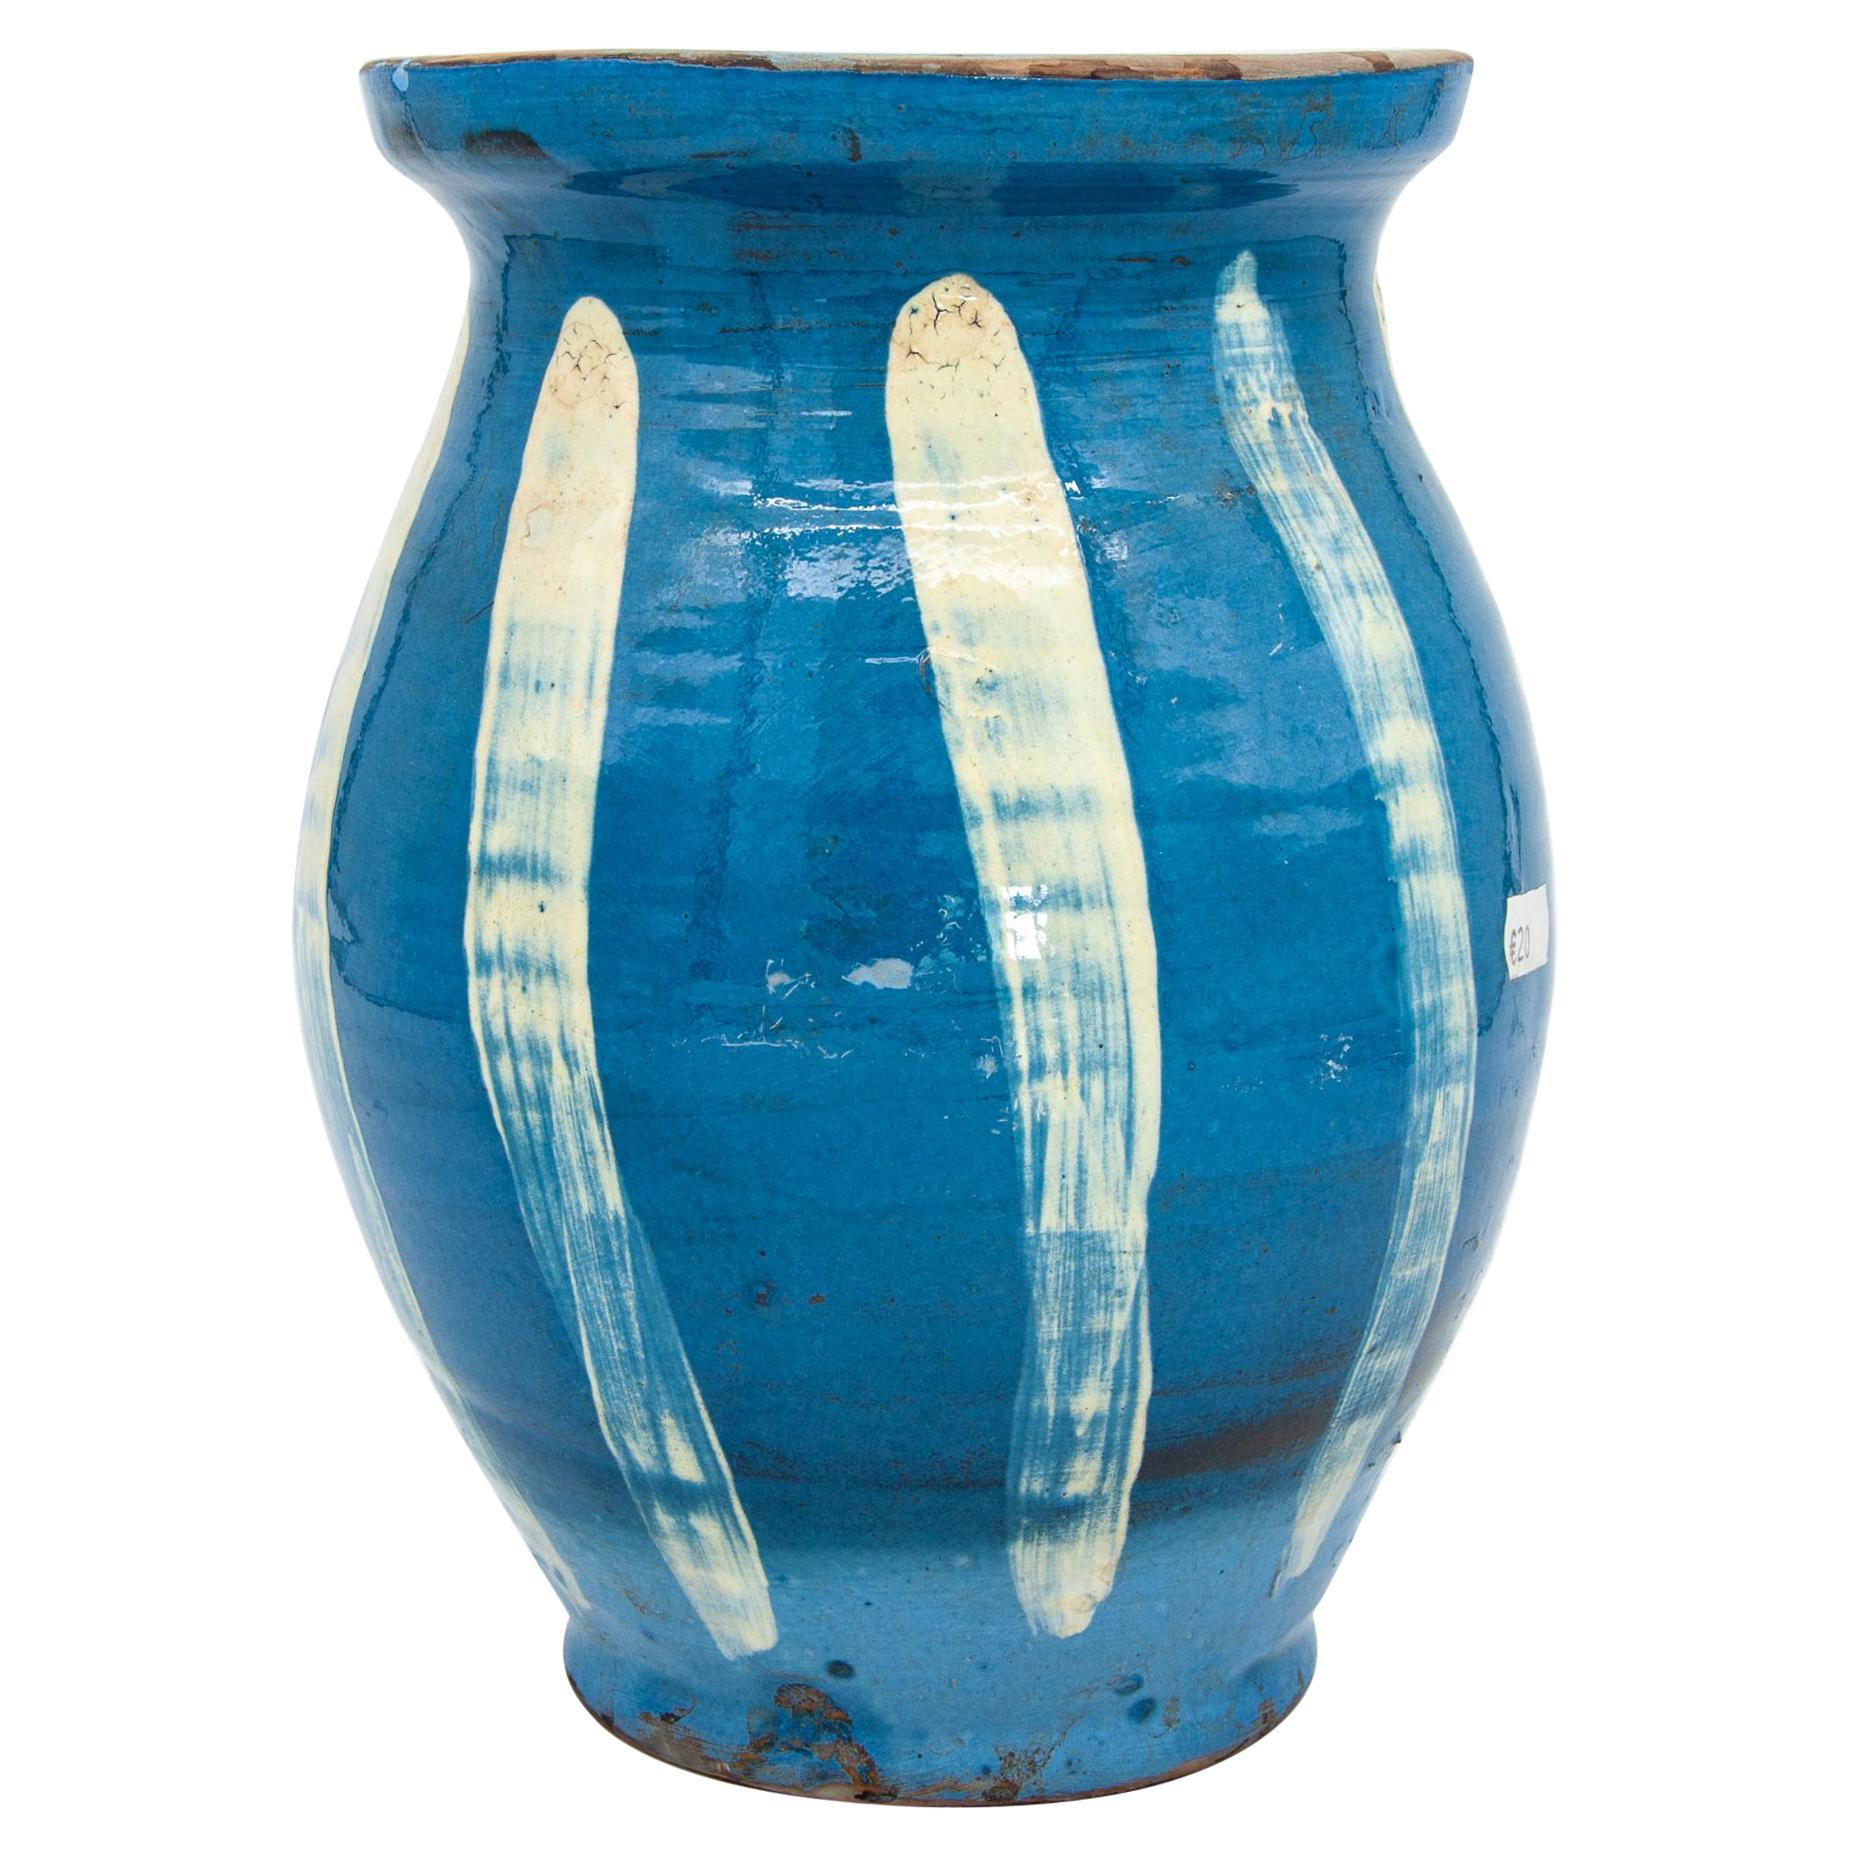 Modern Blue and White Glazed Ceramic Pitcher